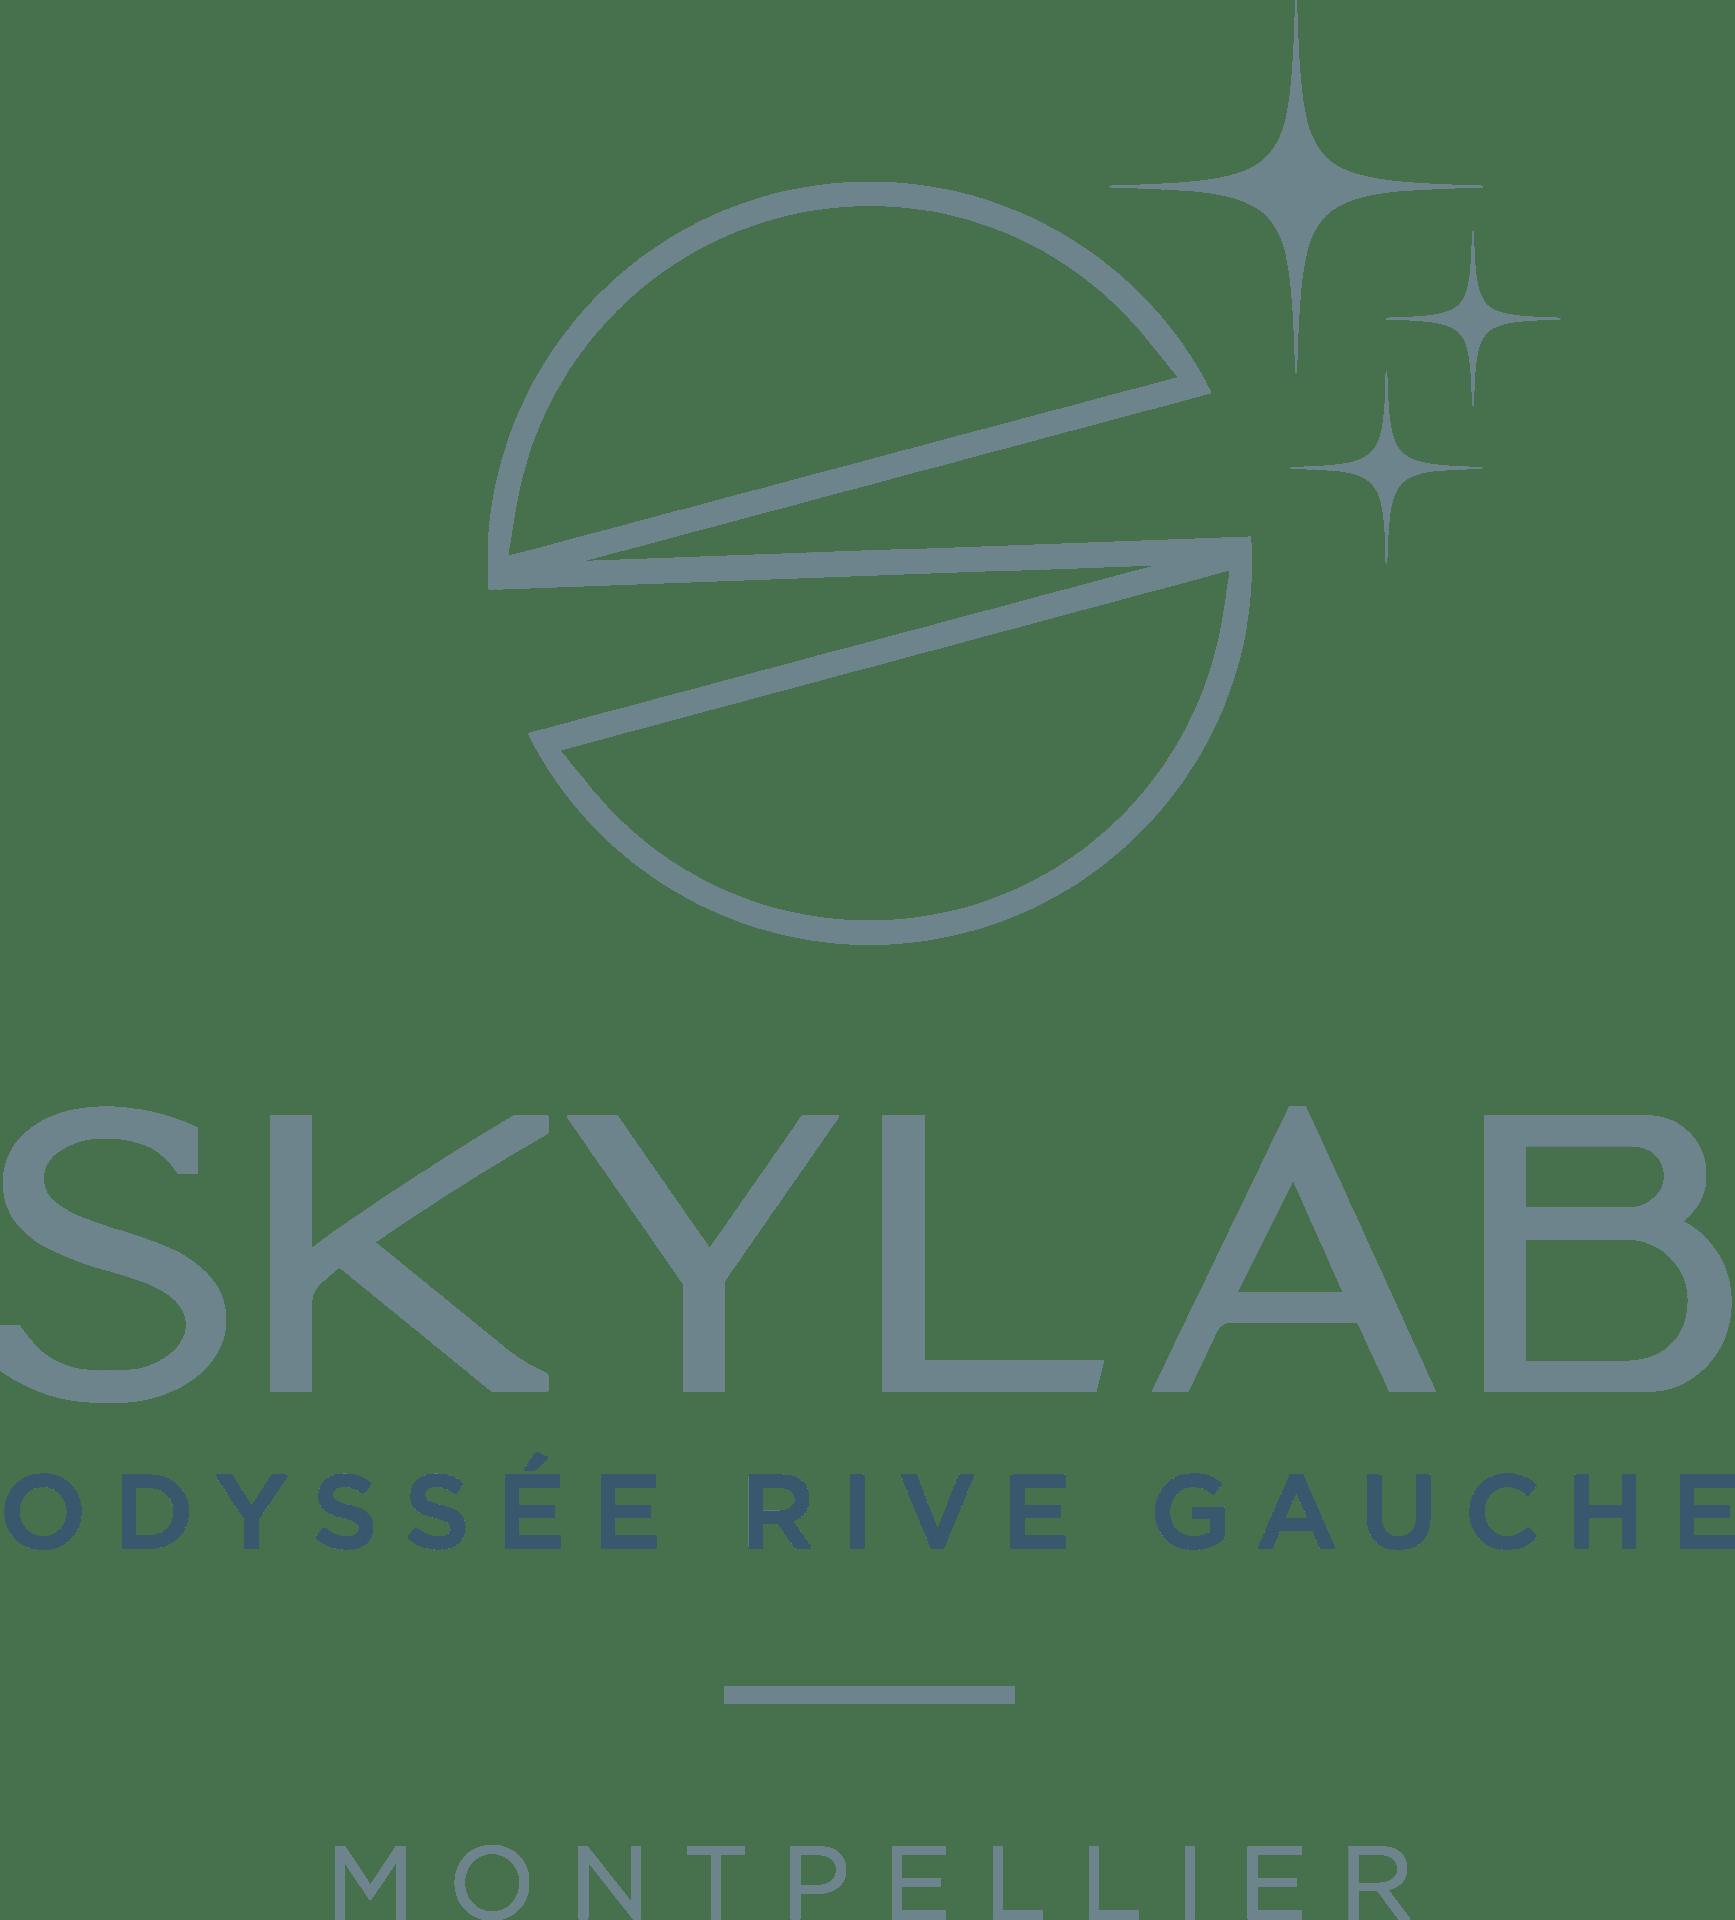 Odyssée Rive Gauche / Skylab - Montpellier - Port Marianne - 34 - Immobilier neuf